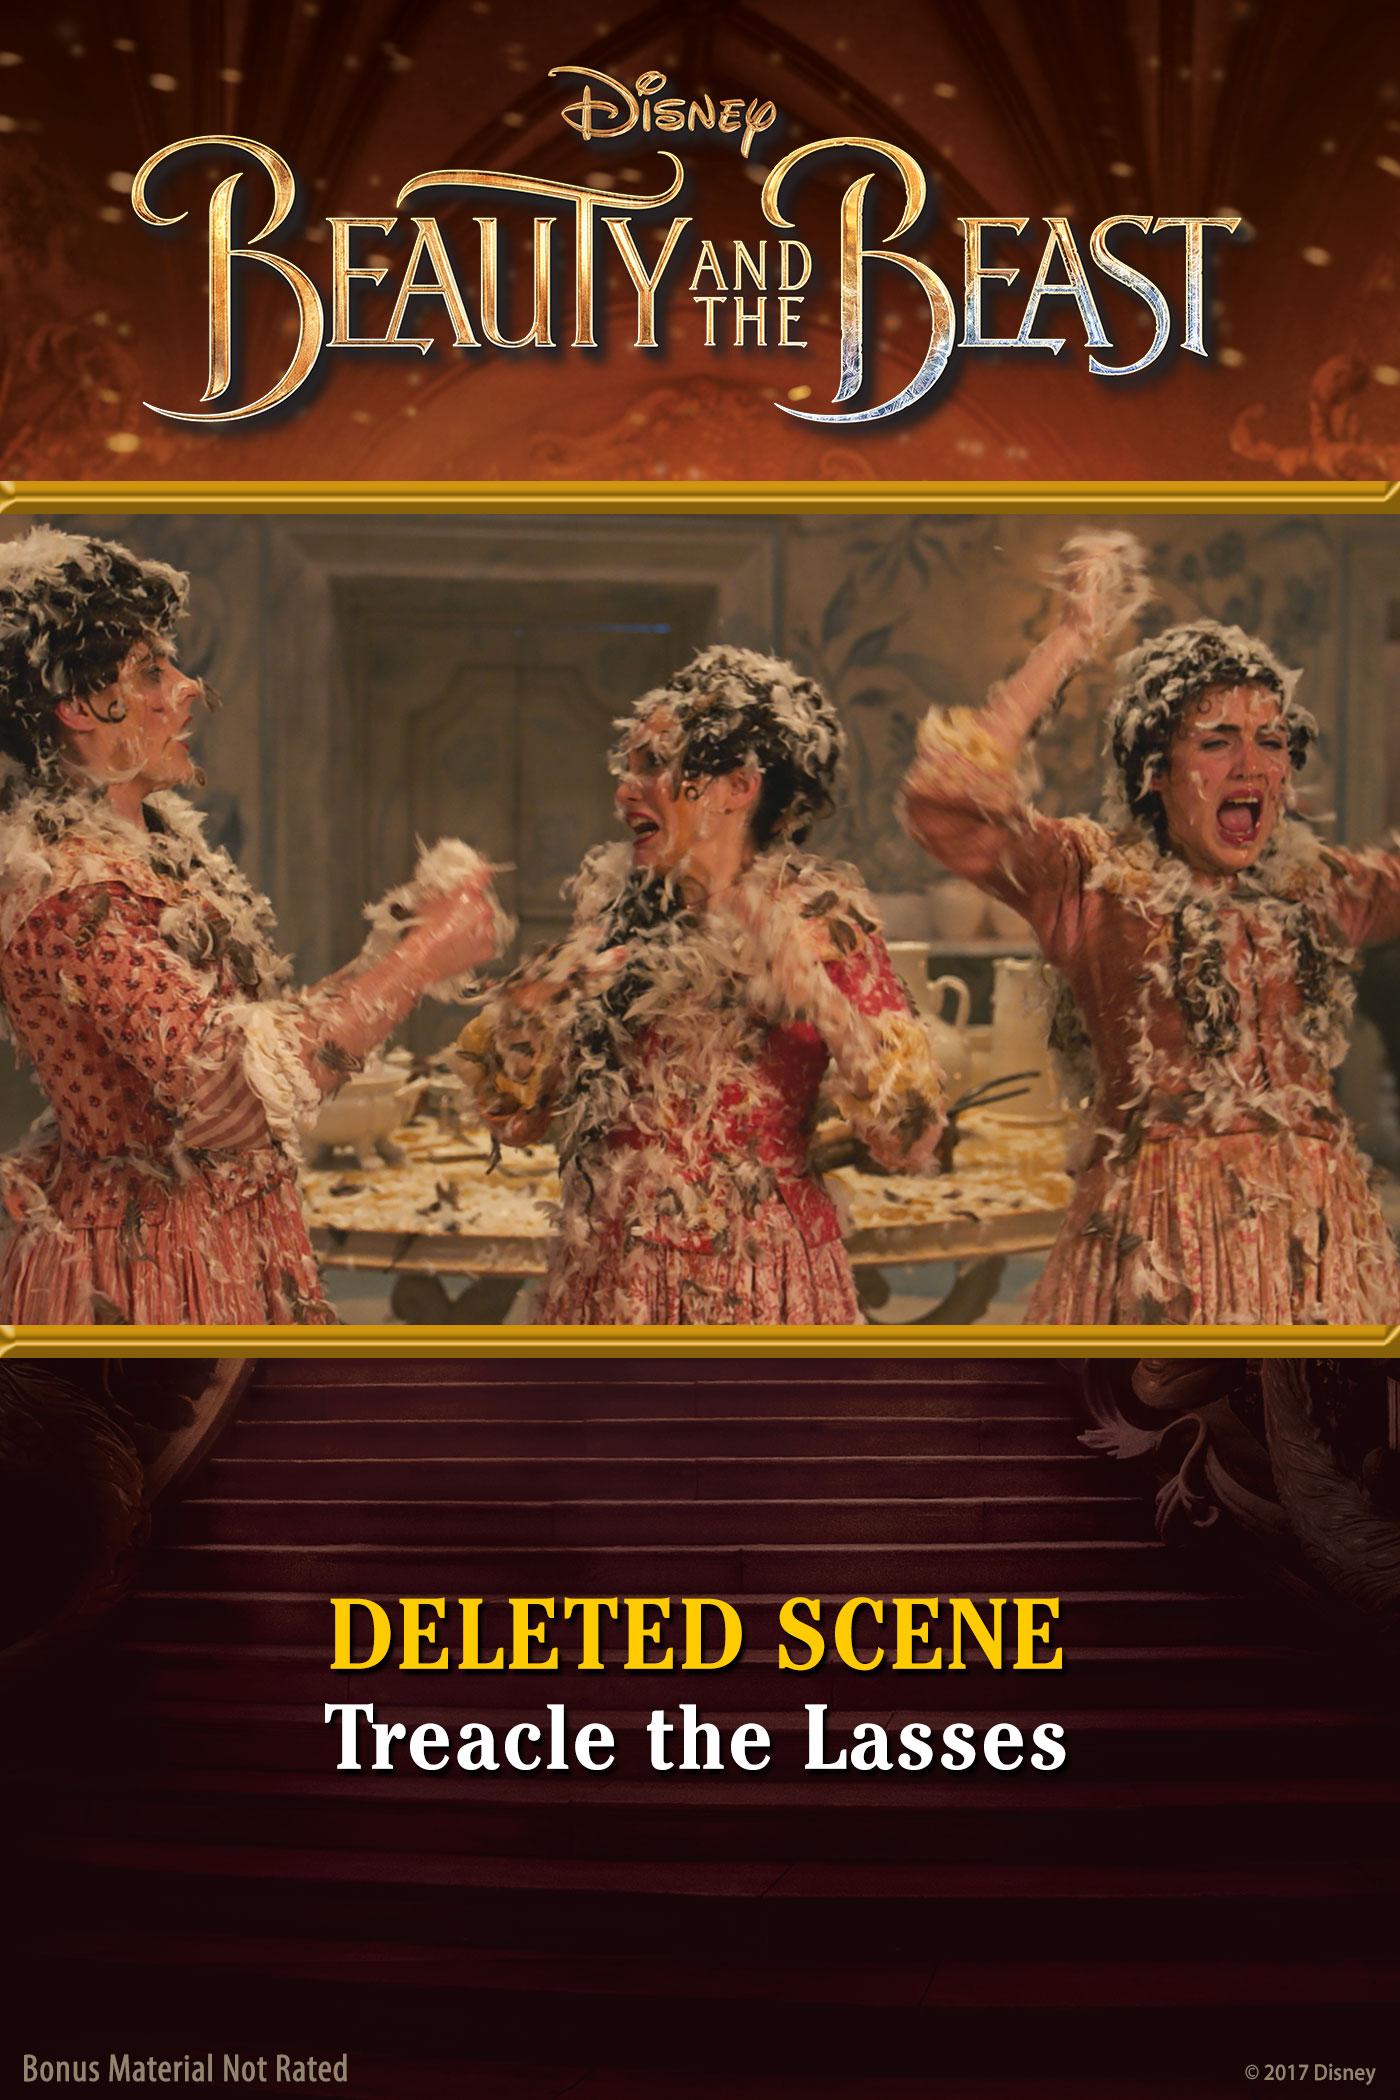 Deleted Scene: Treacle the Lasses